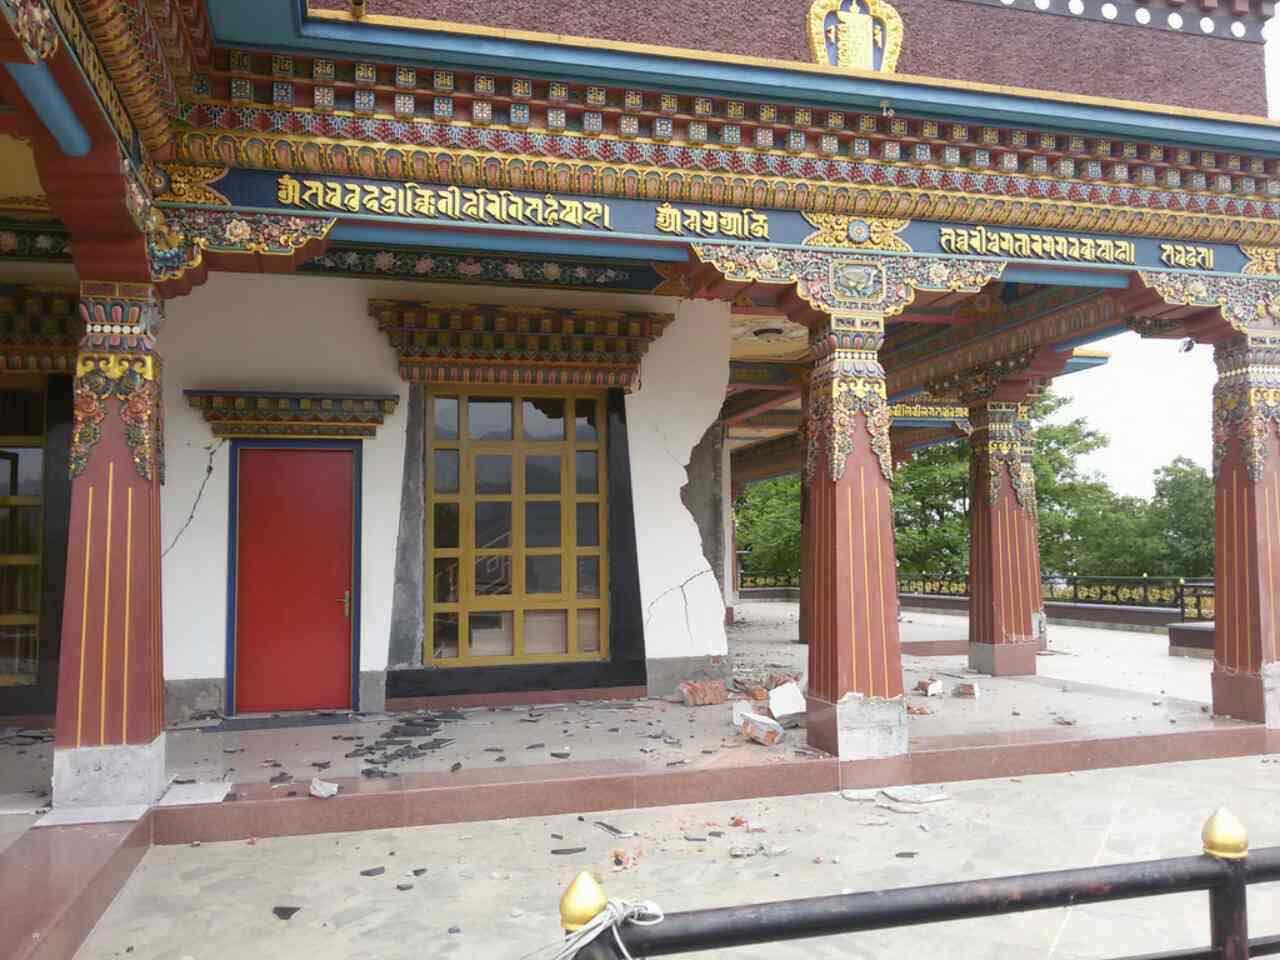 Earthquake damages Amitabha Retreat Center in Nepal